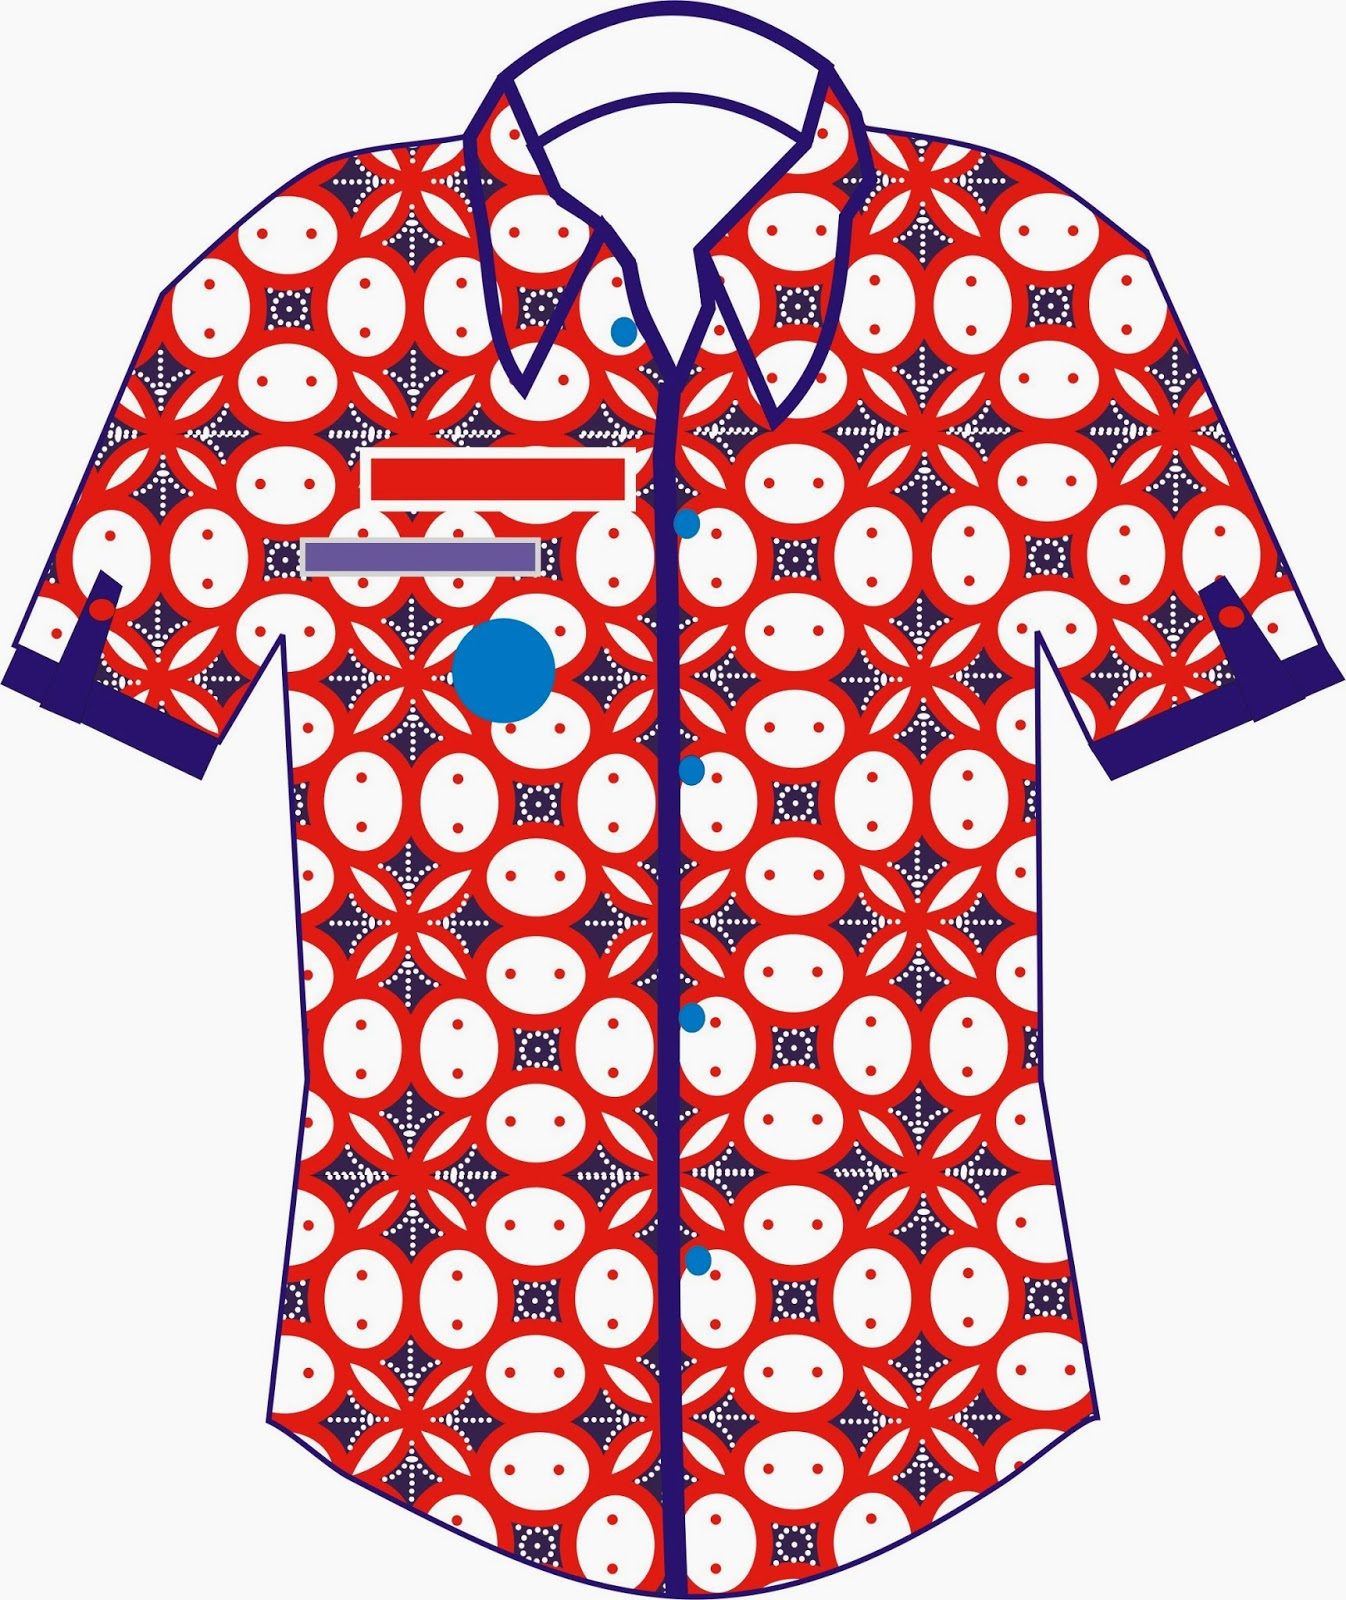 Trend Desain Label Baju Cdr Gambar Stiker